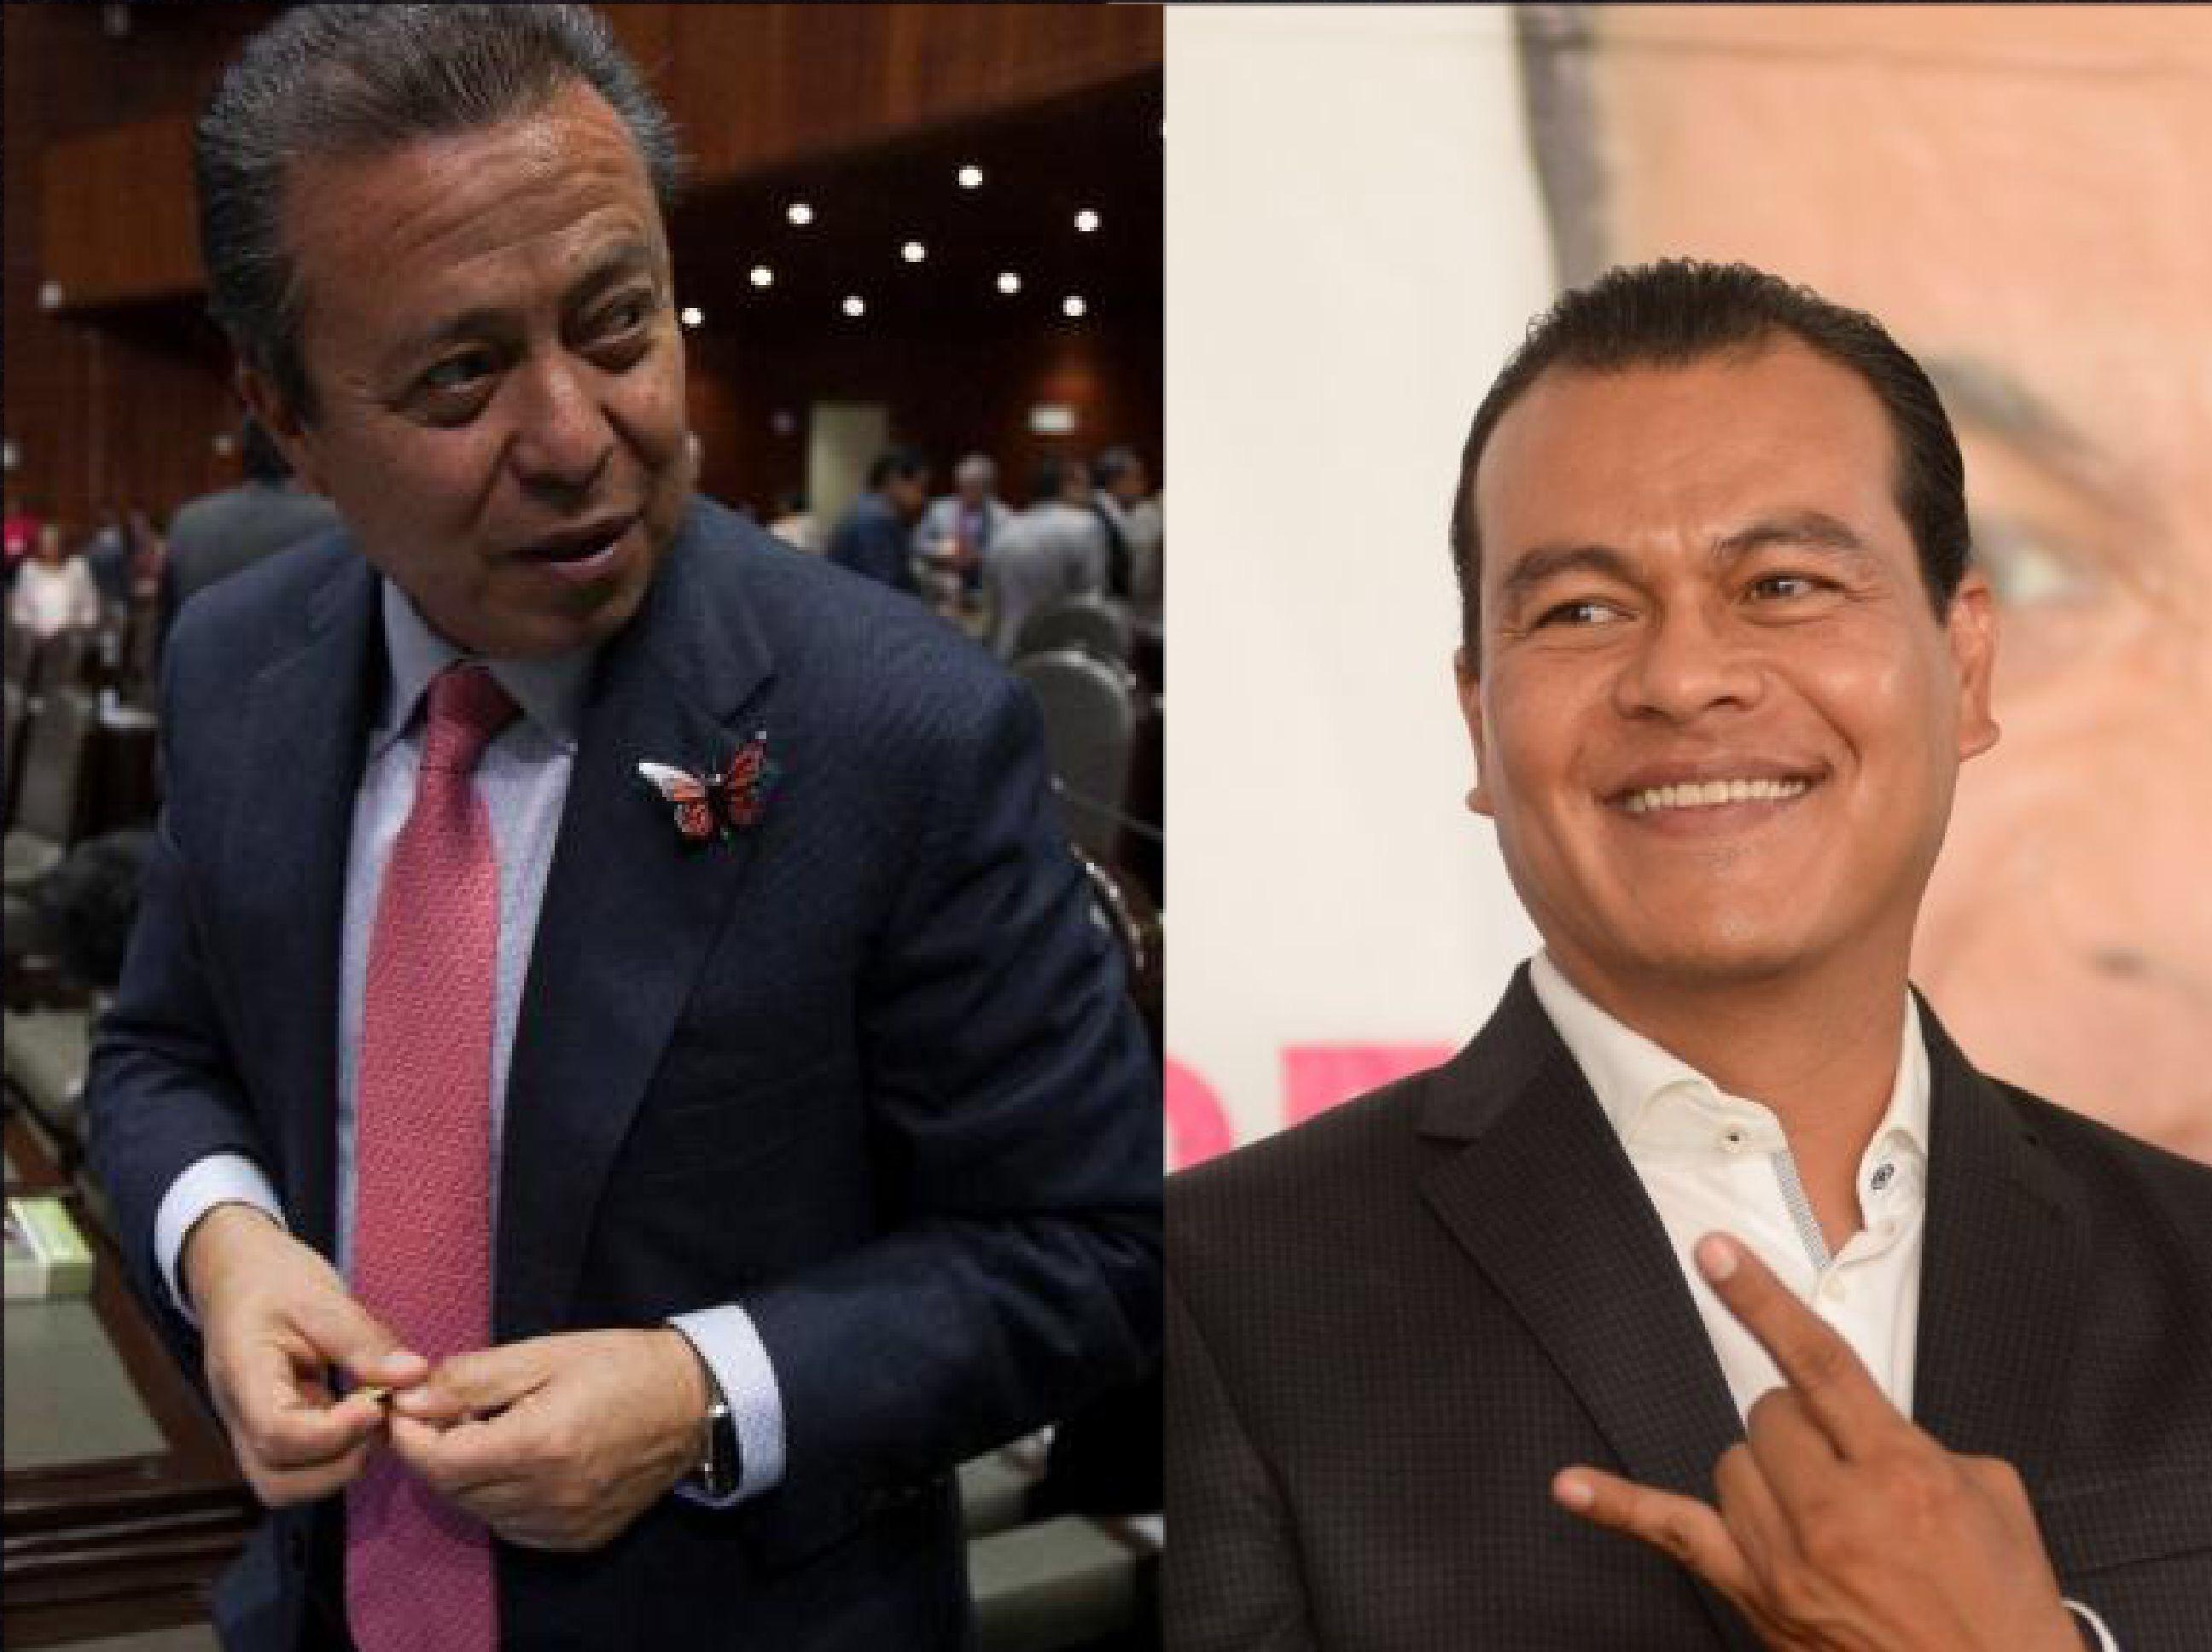 Le respetan lugar en Senado a Juan Zepeda